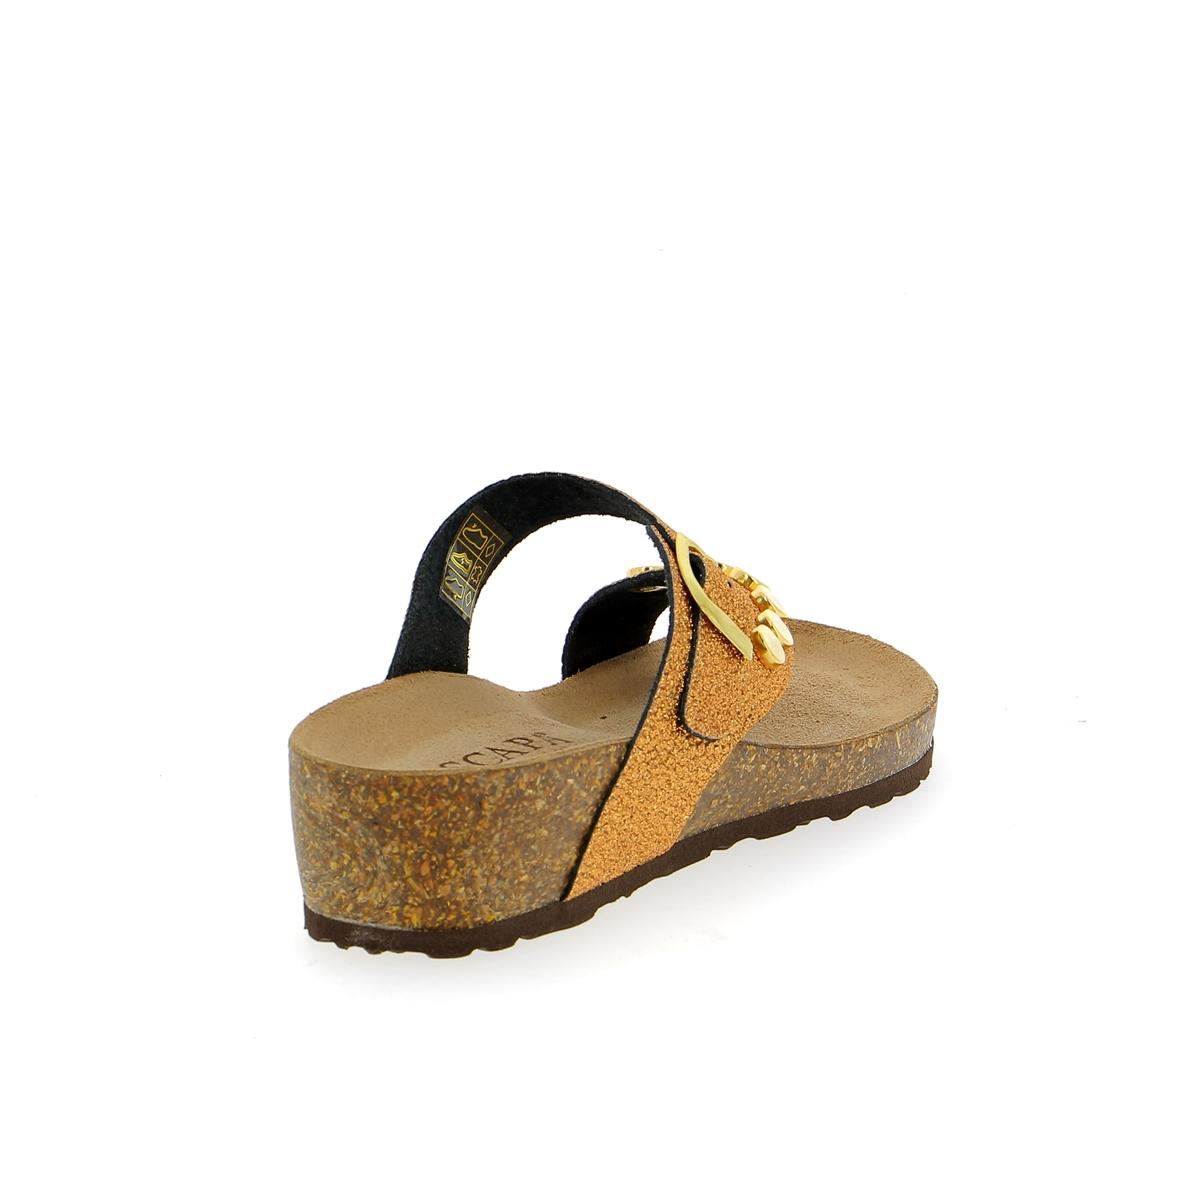 Scapa Mulles bronze